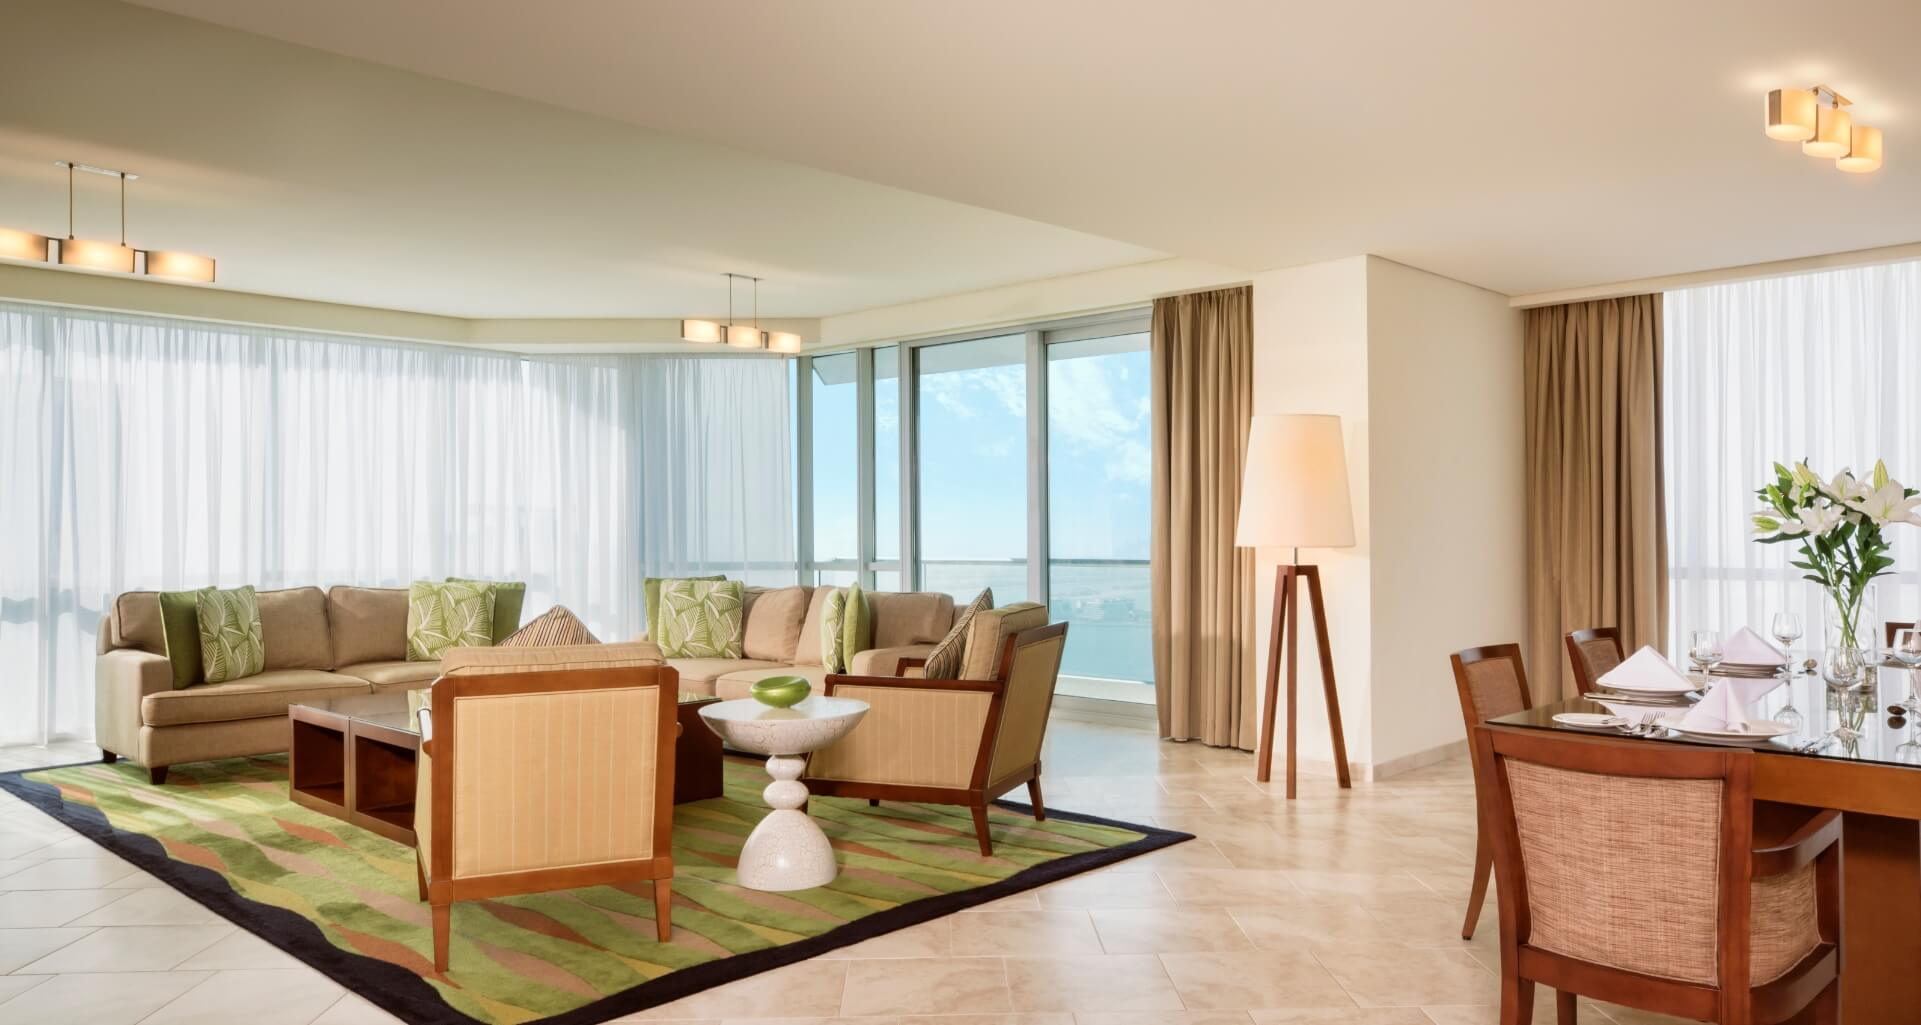 JA Oasis Beach Tower 4-bedroom Apartment - Living Room (1).jpg